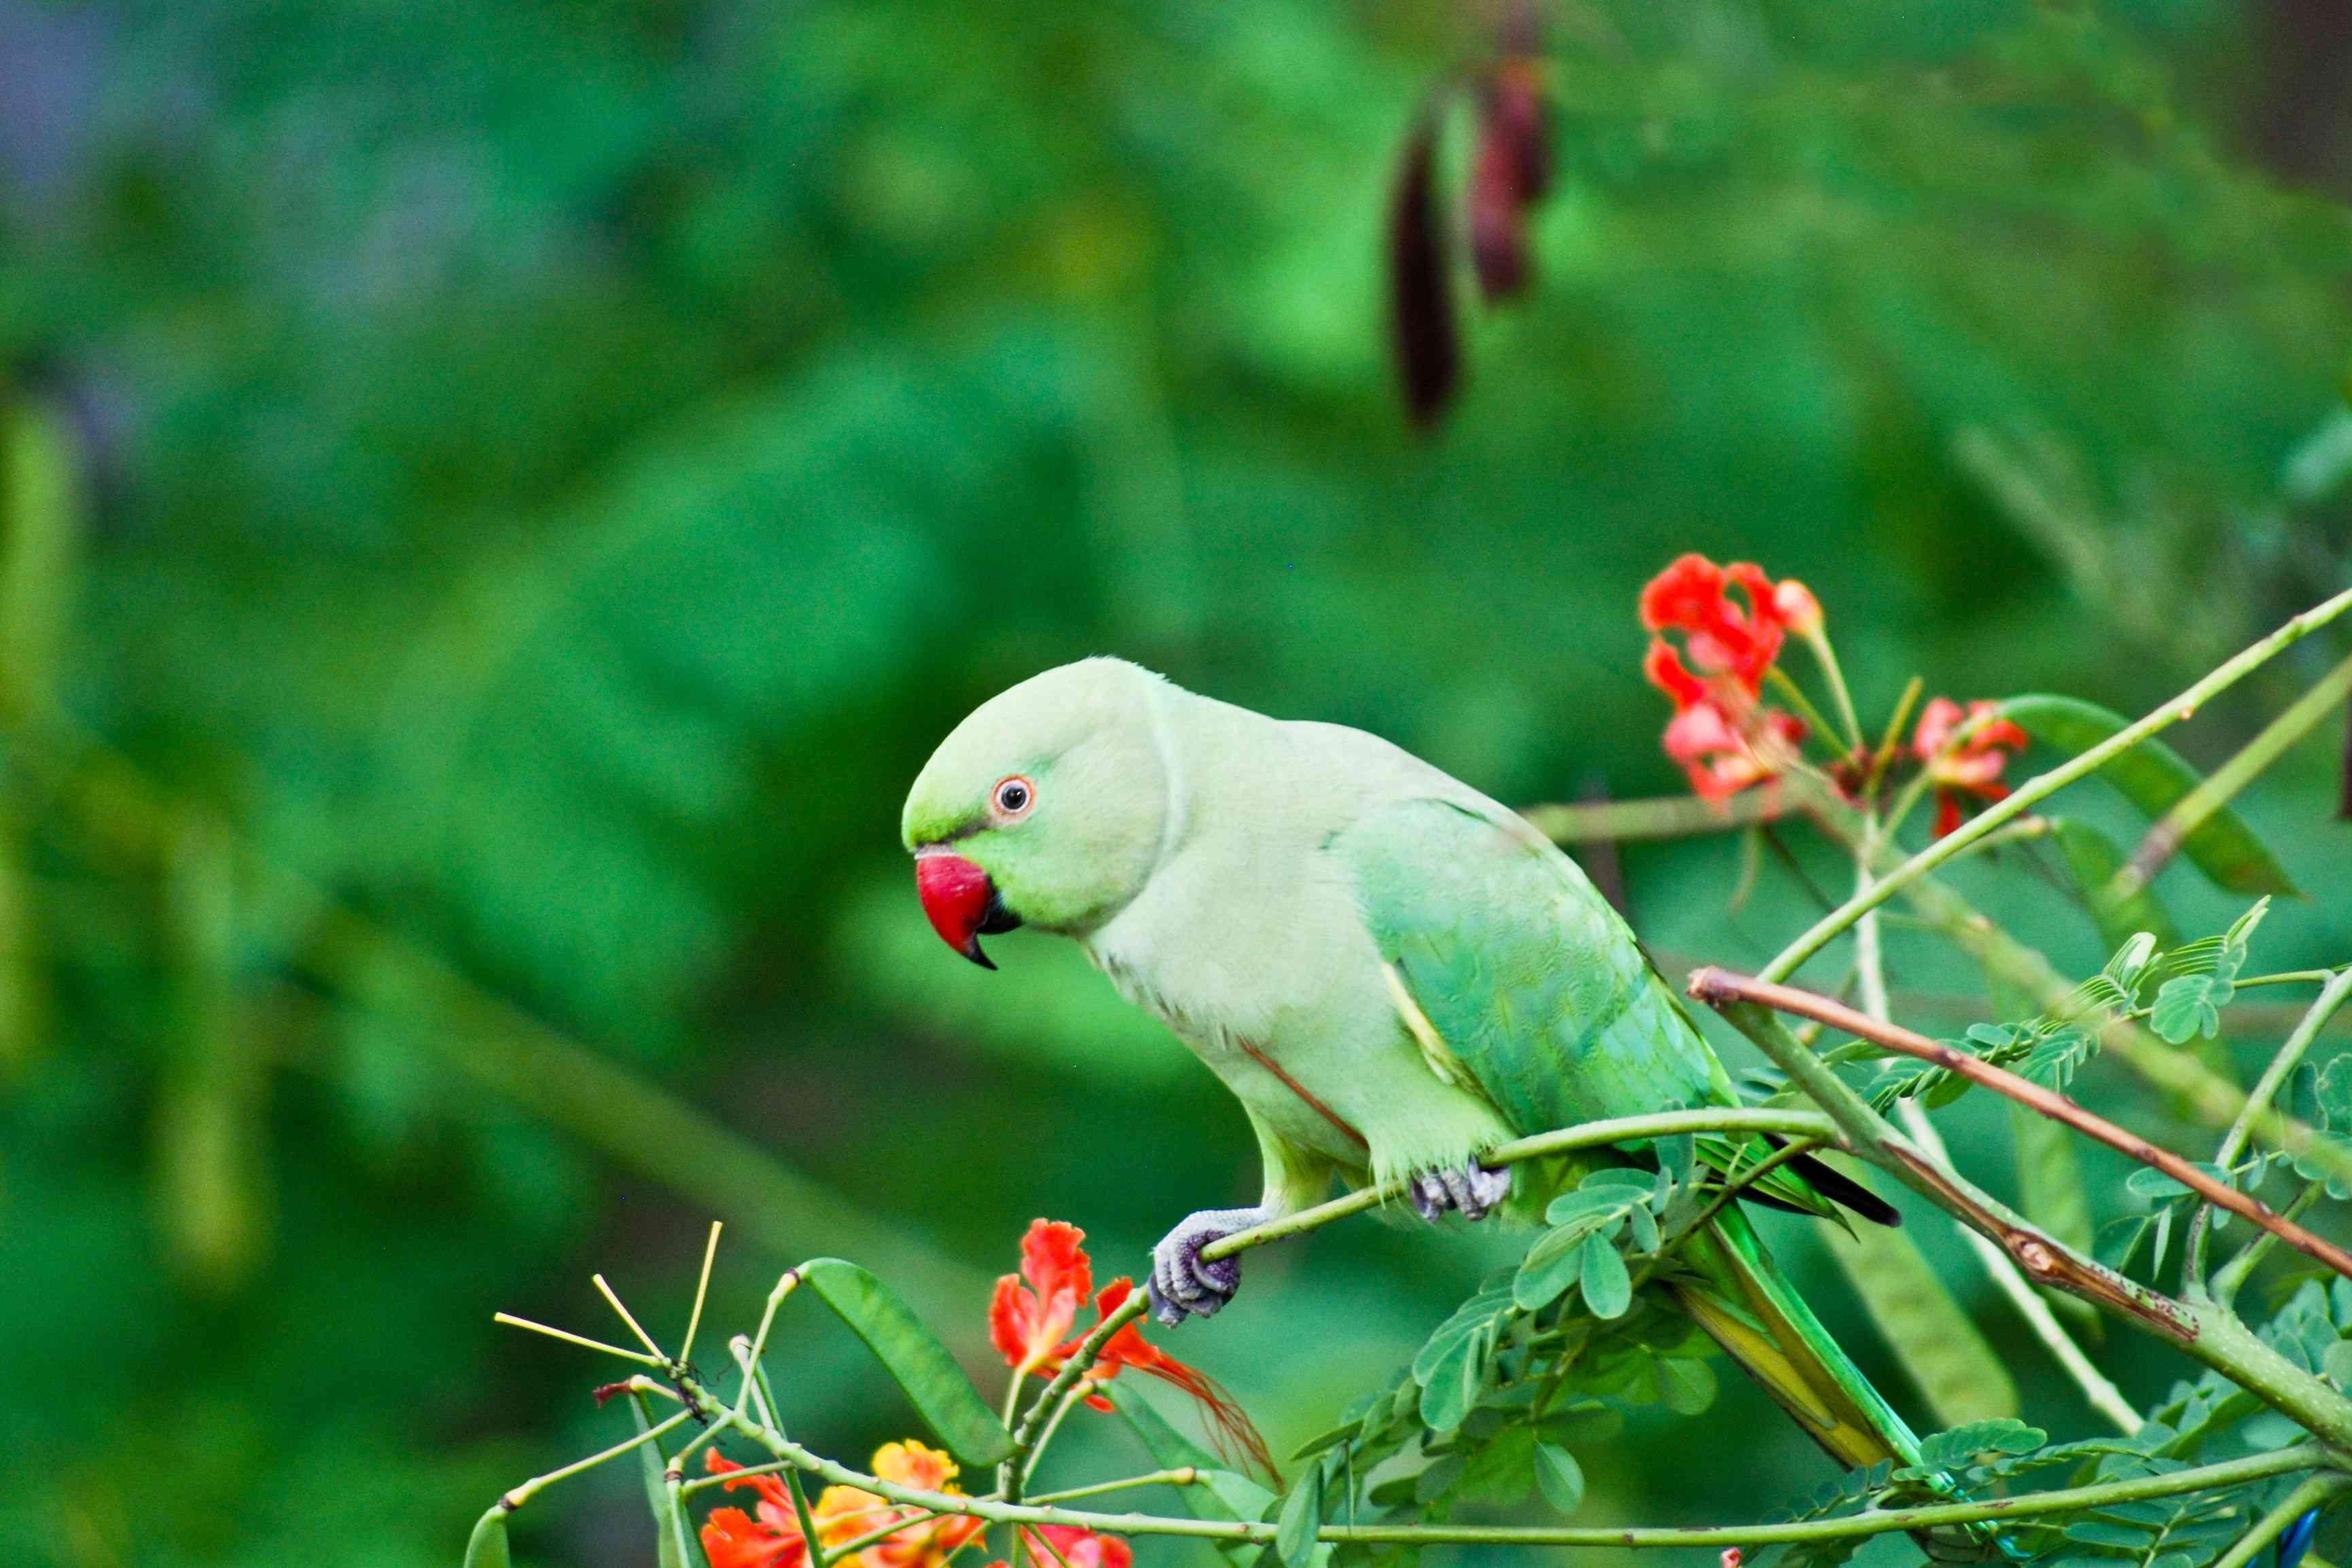 Indian ringneck parakeet in a tree